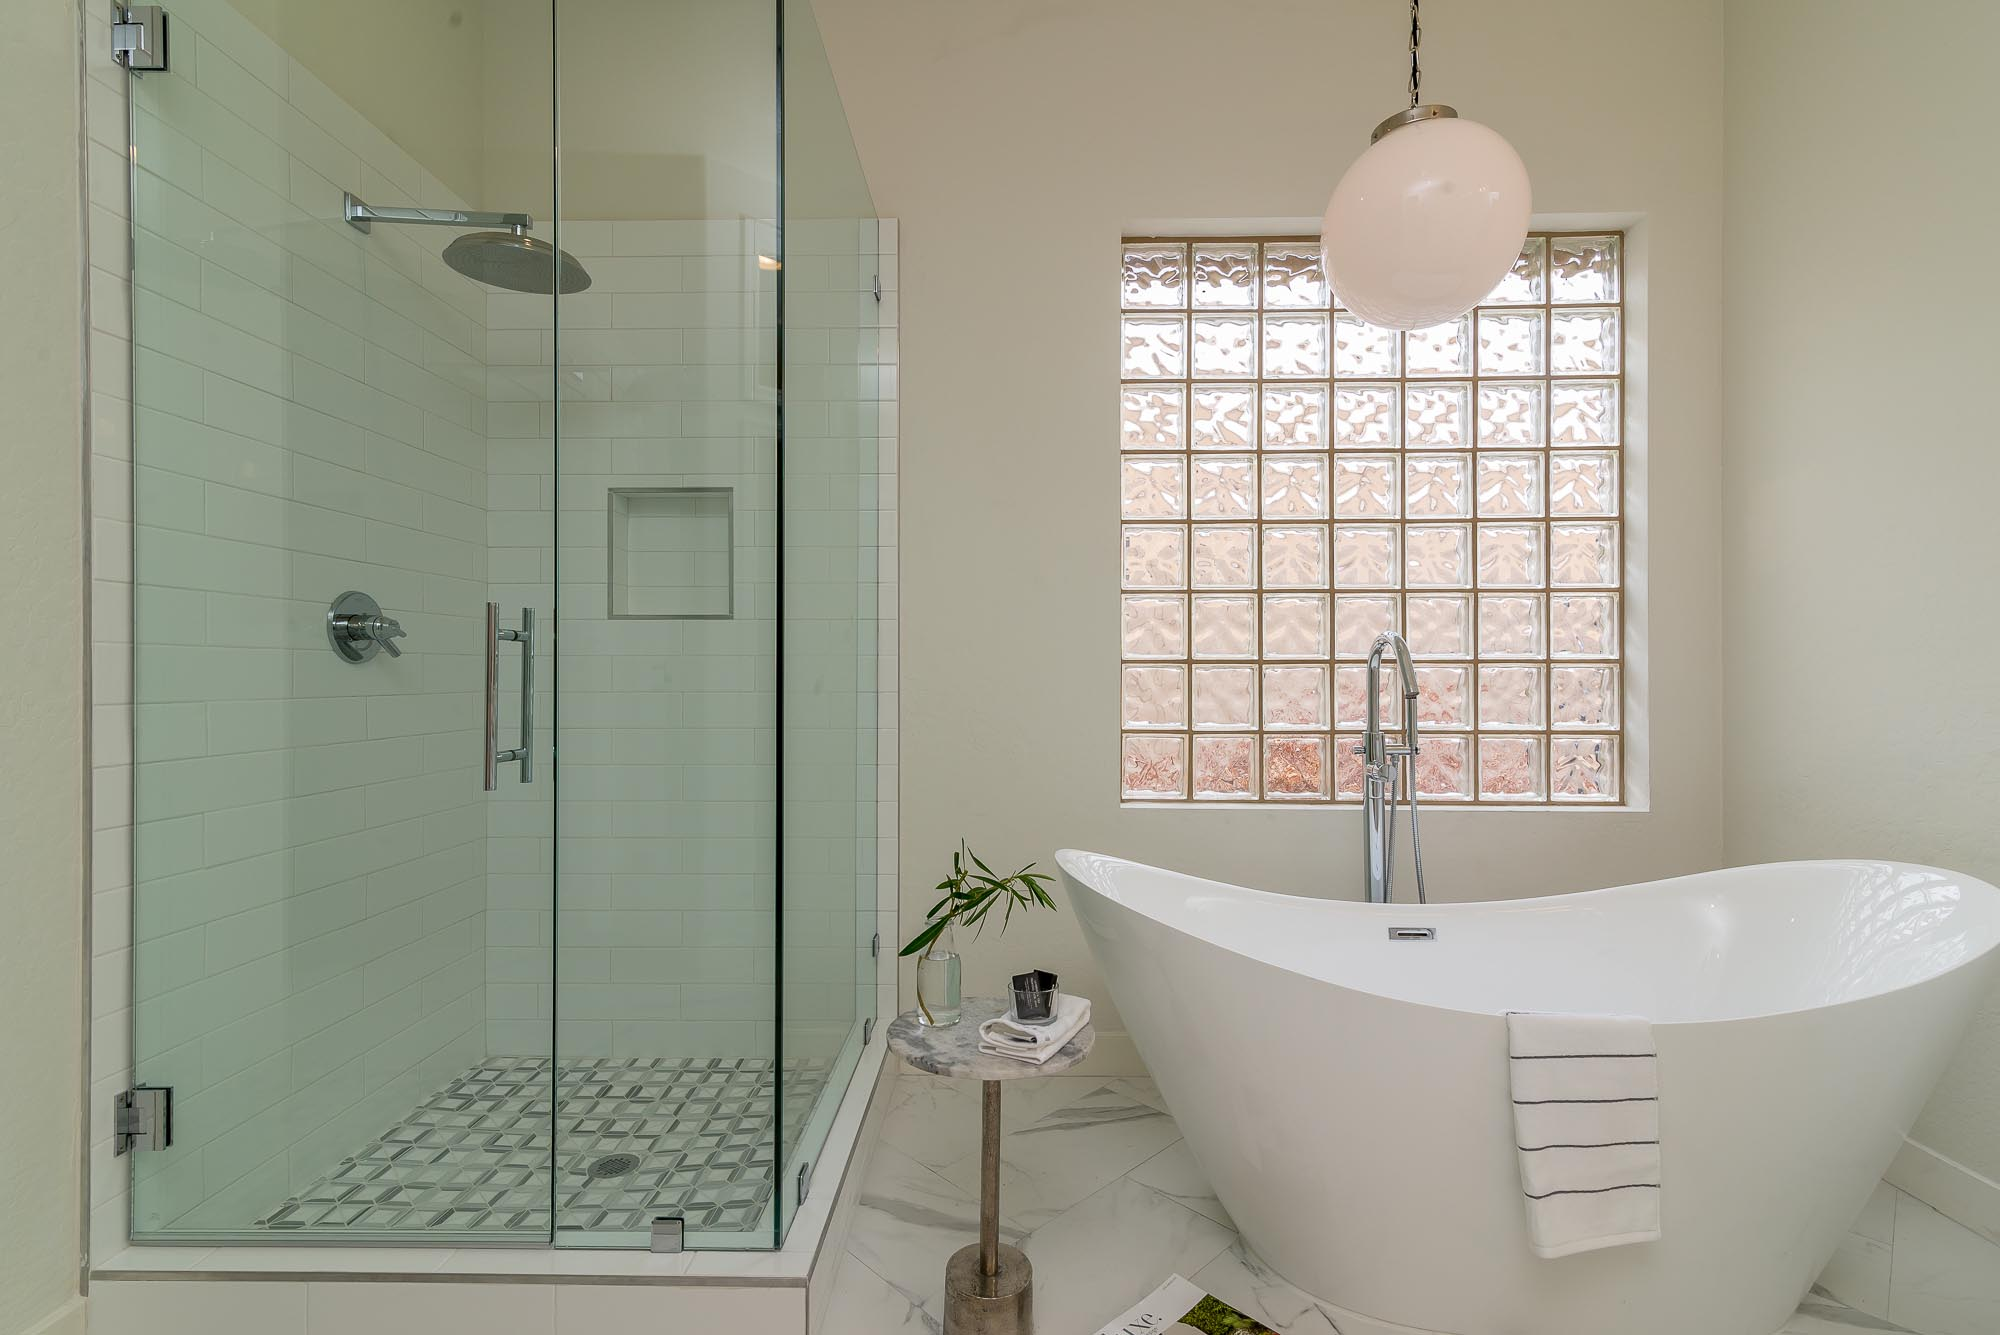 Bathroom with bathtub and glass shower room